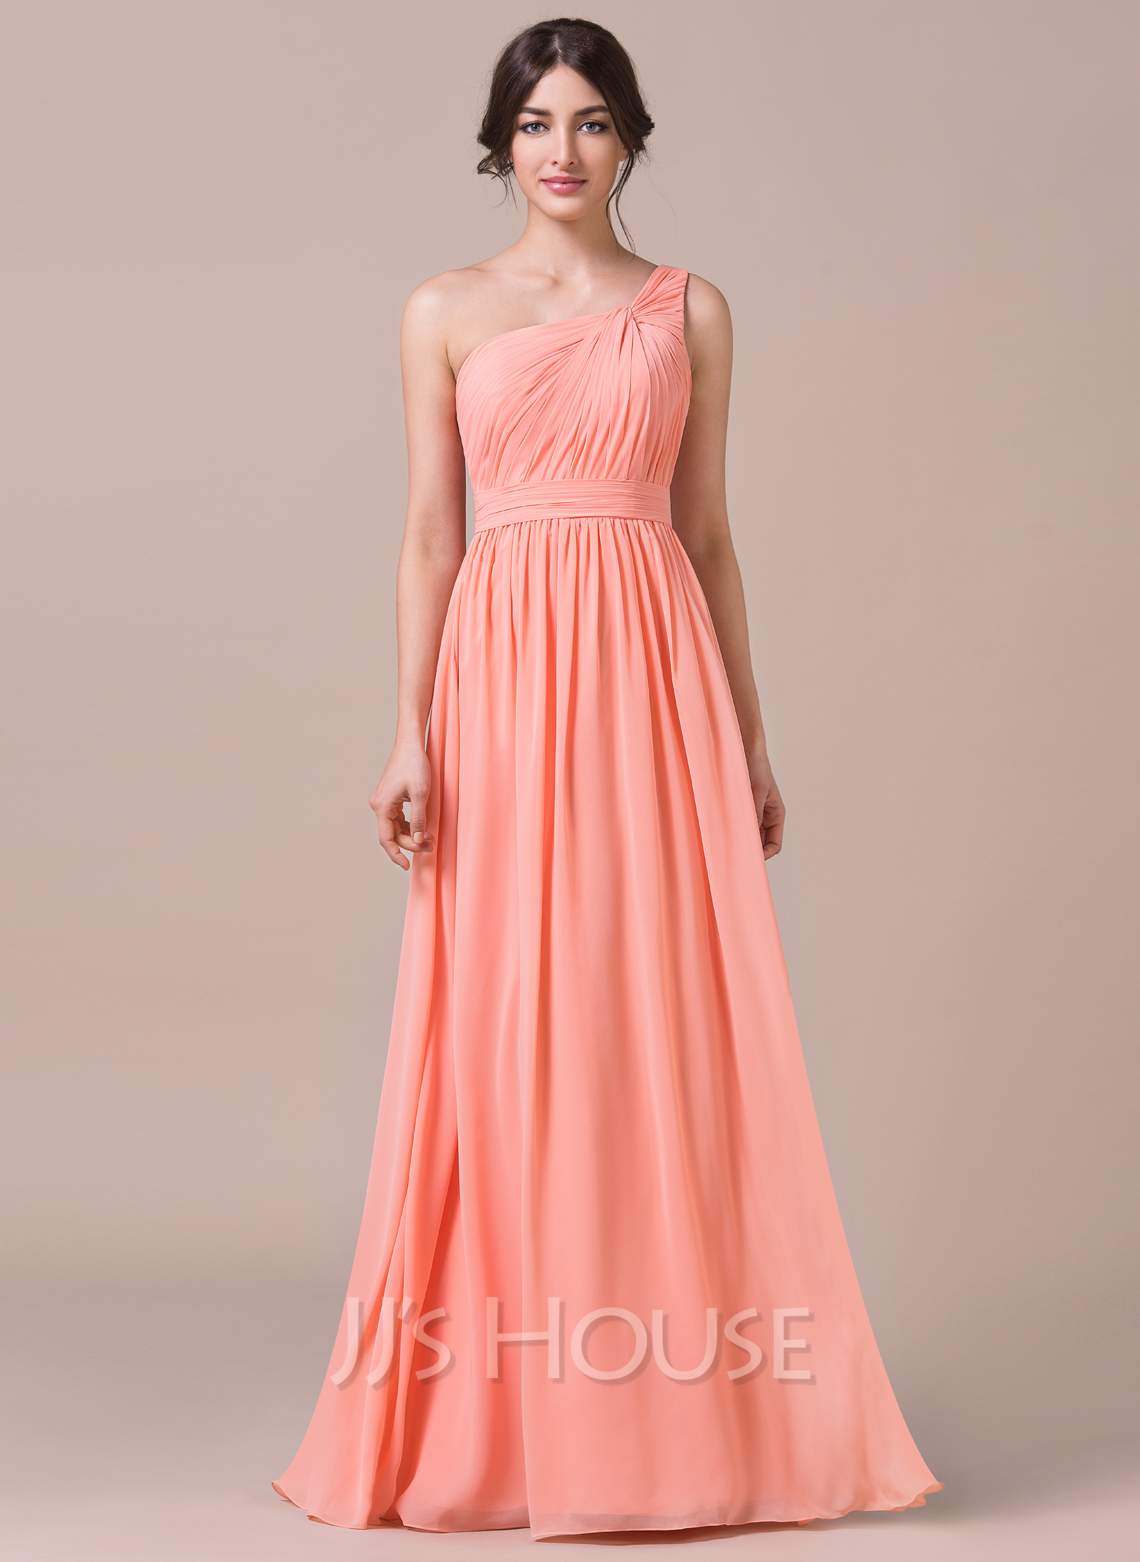 A line princess one shoulder floor length chiffon for Jj house wedding dress